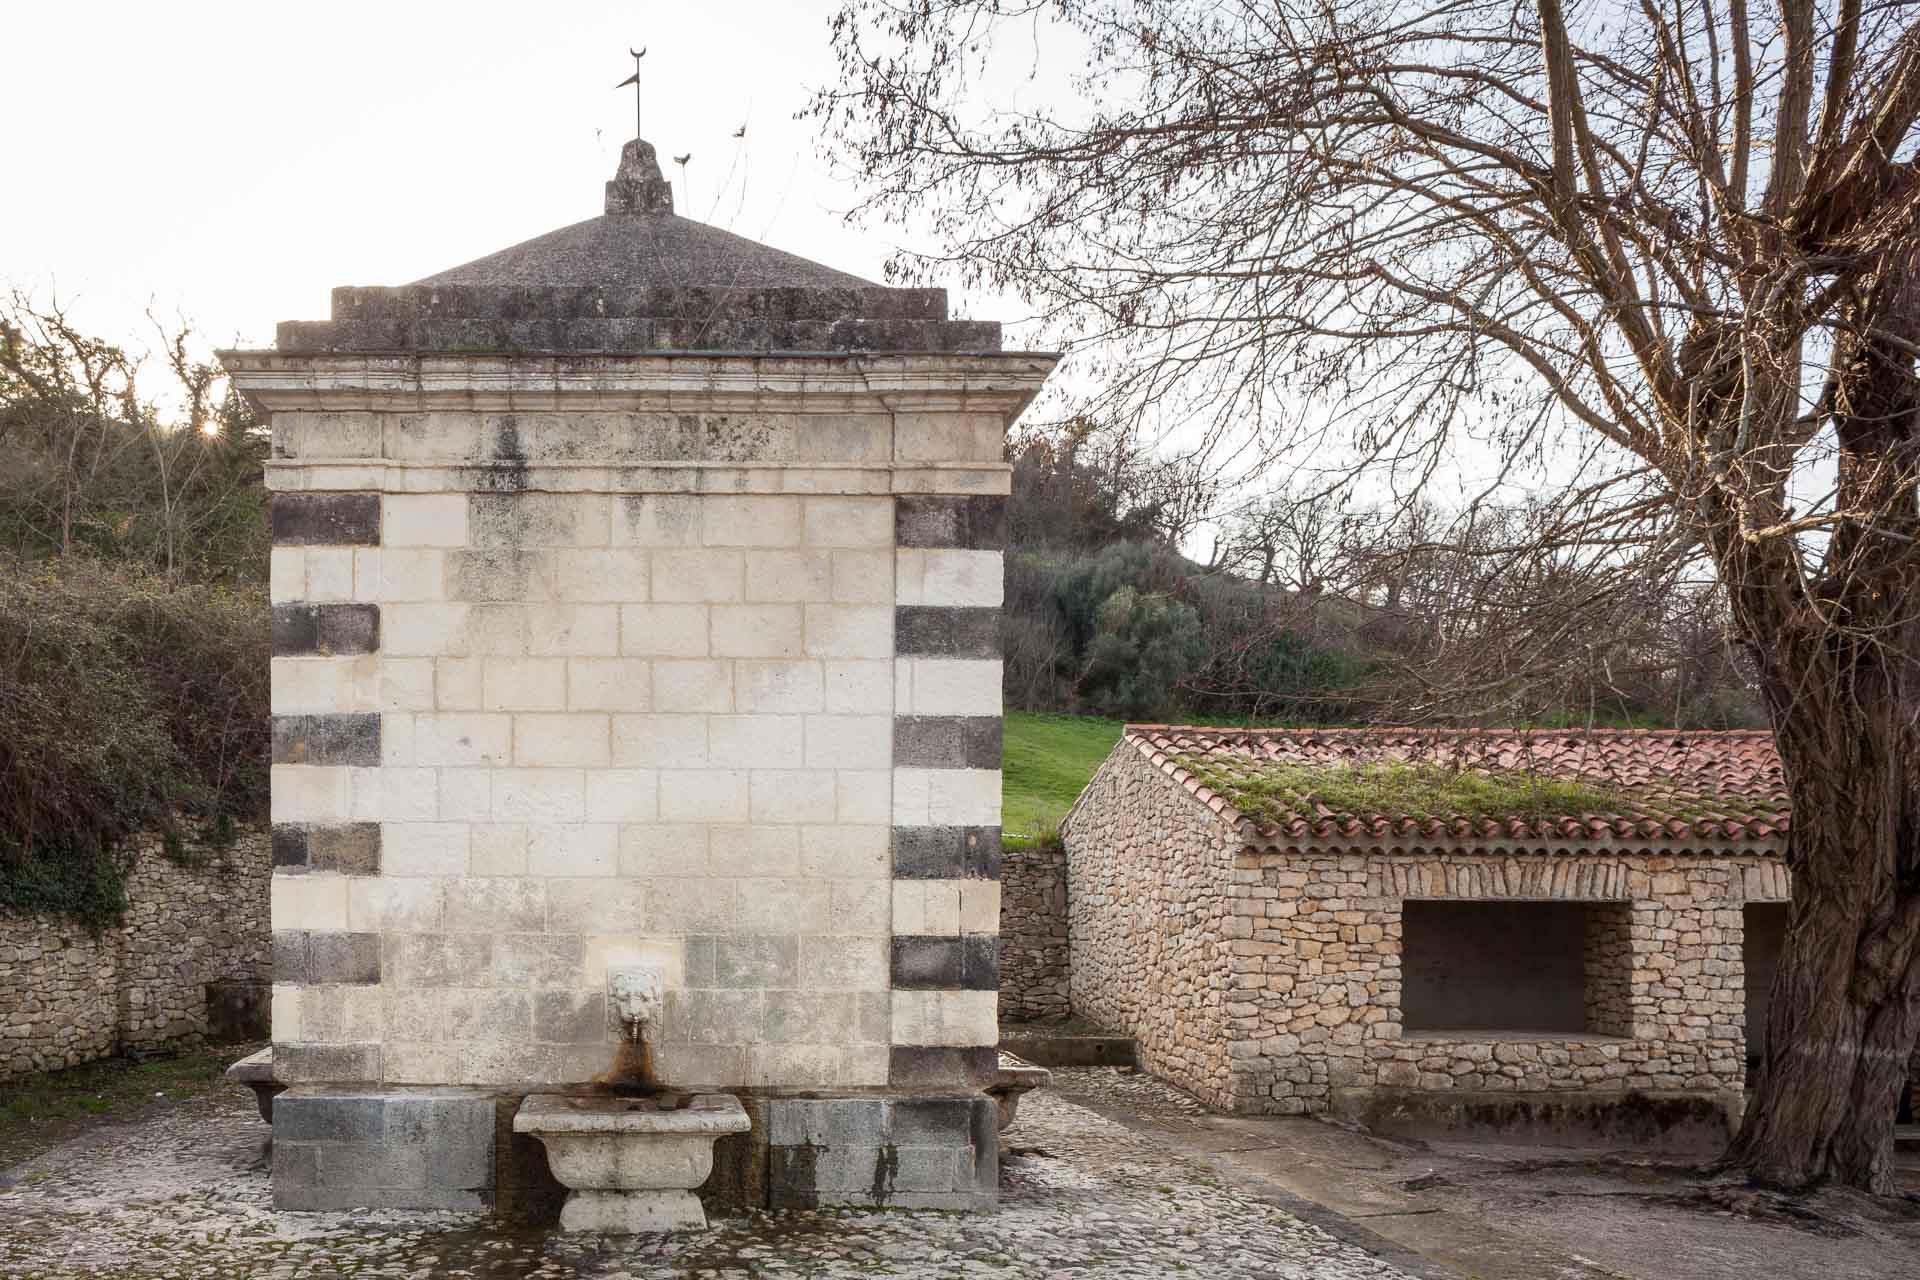 Torralba, Fontana